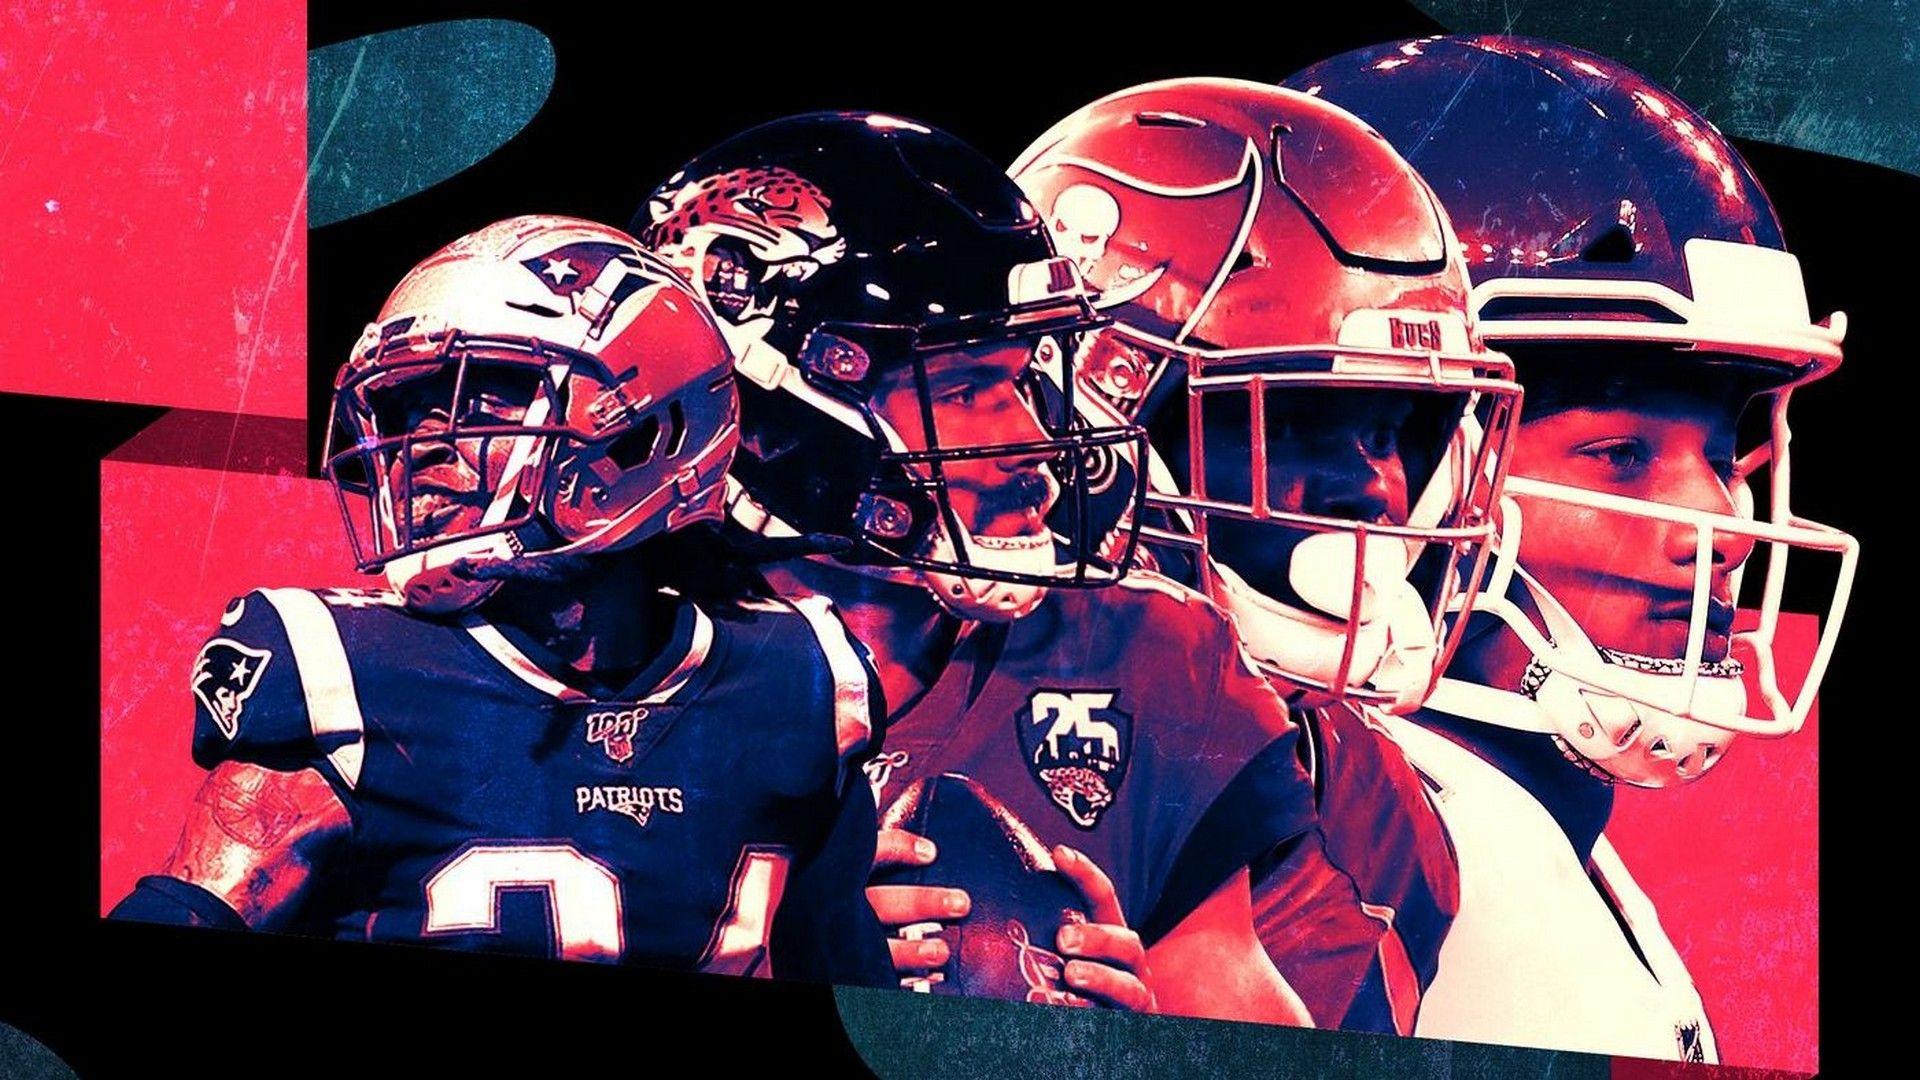 Wallpapers HD NFL   Football wallpaper, Football, Nfl